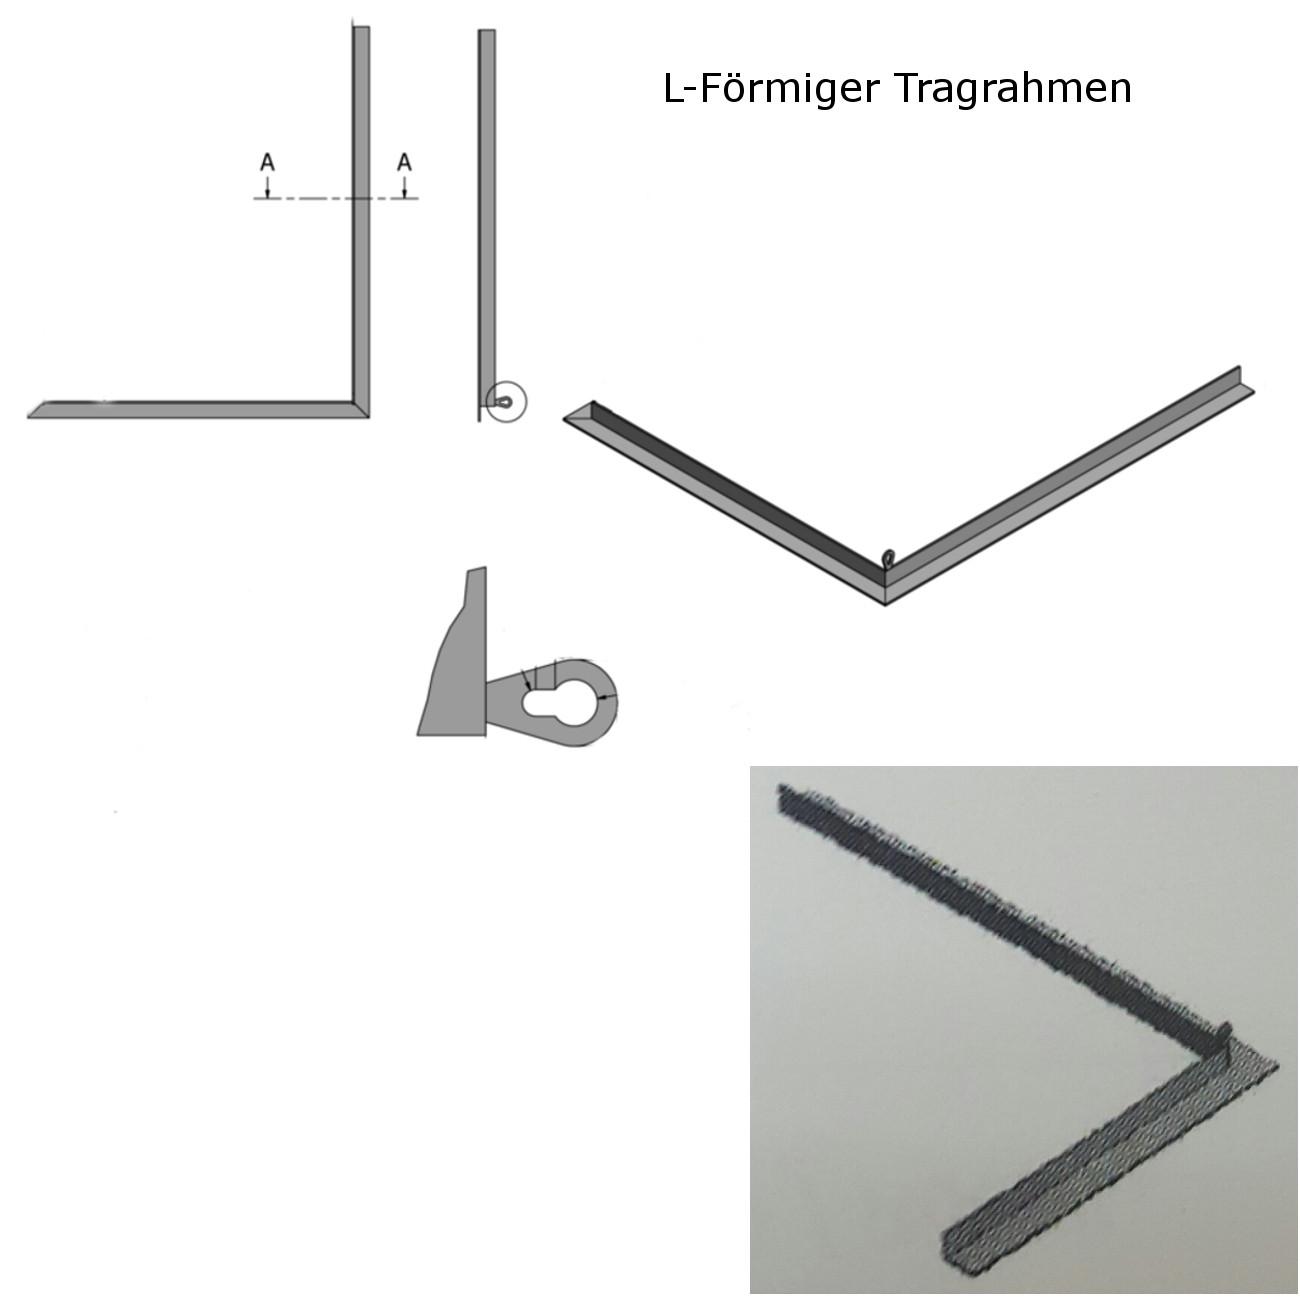 kaminbausatz-l-f-rmiger-tragrahmen-webIst4TueeTsZsn